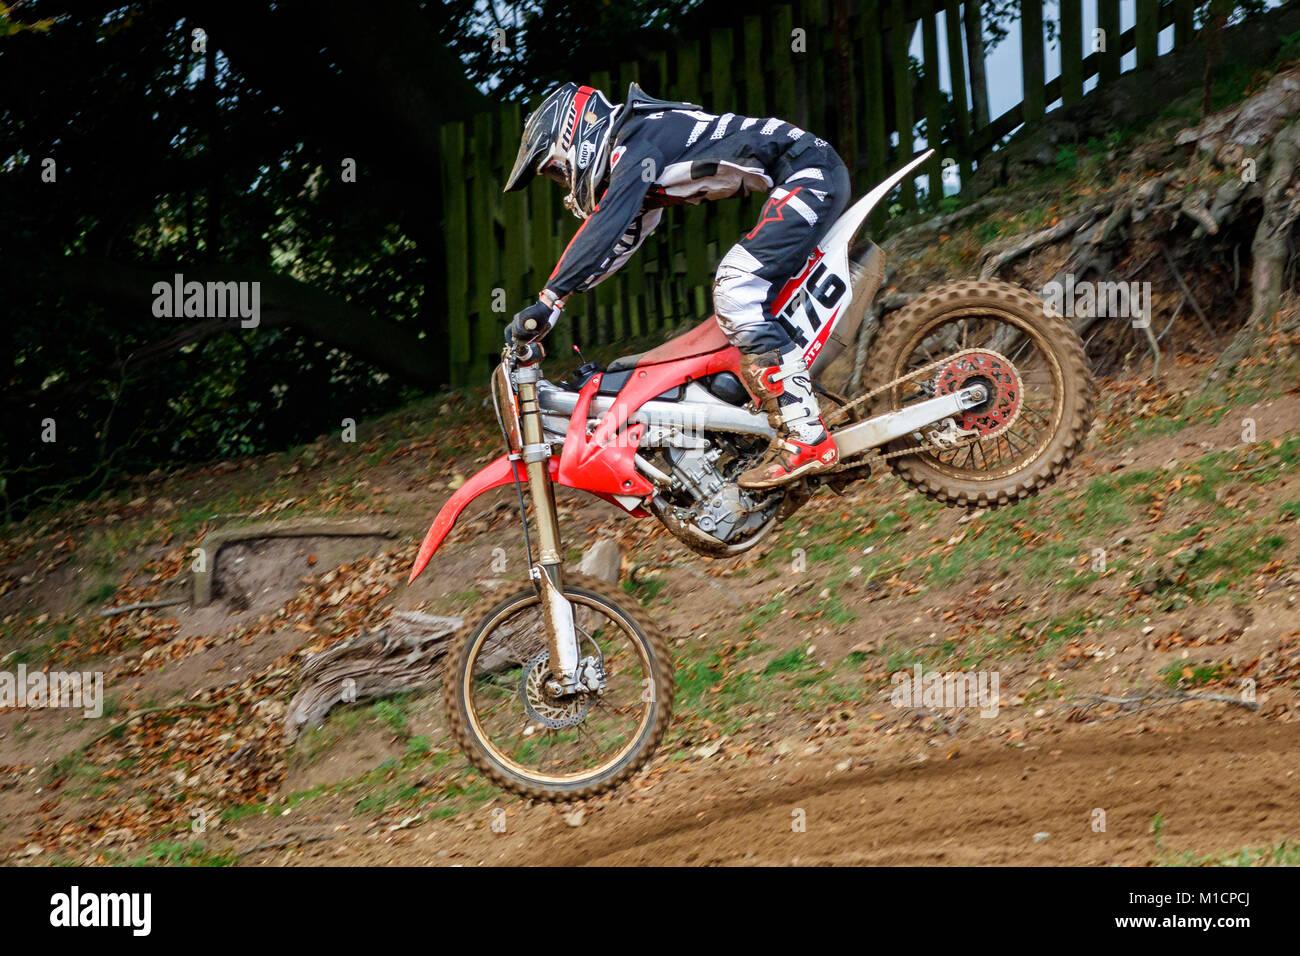 Zak Roberts on the Honda 250 at the NGR & ACU Eastern EVO Motocross Championships, Cadders Hill, Lyng, Norfolk, - Stock Image